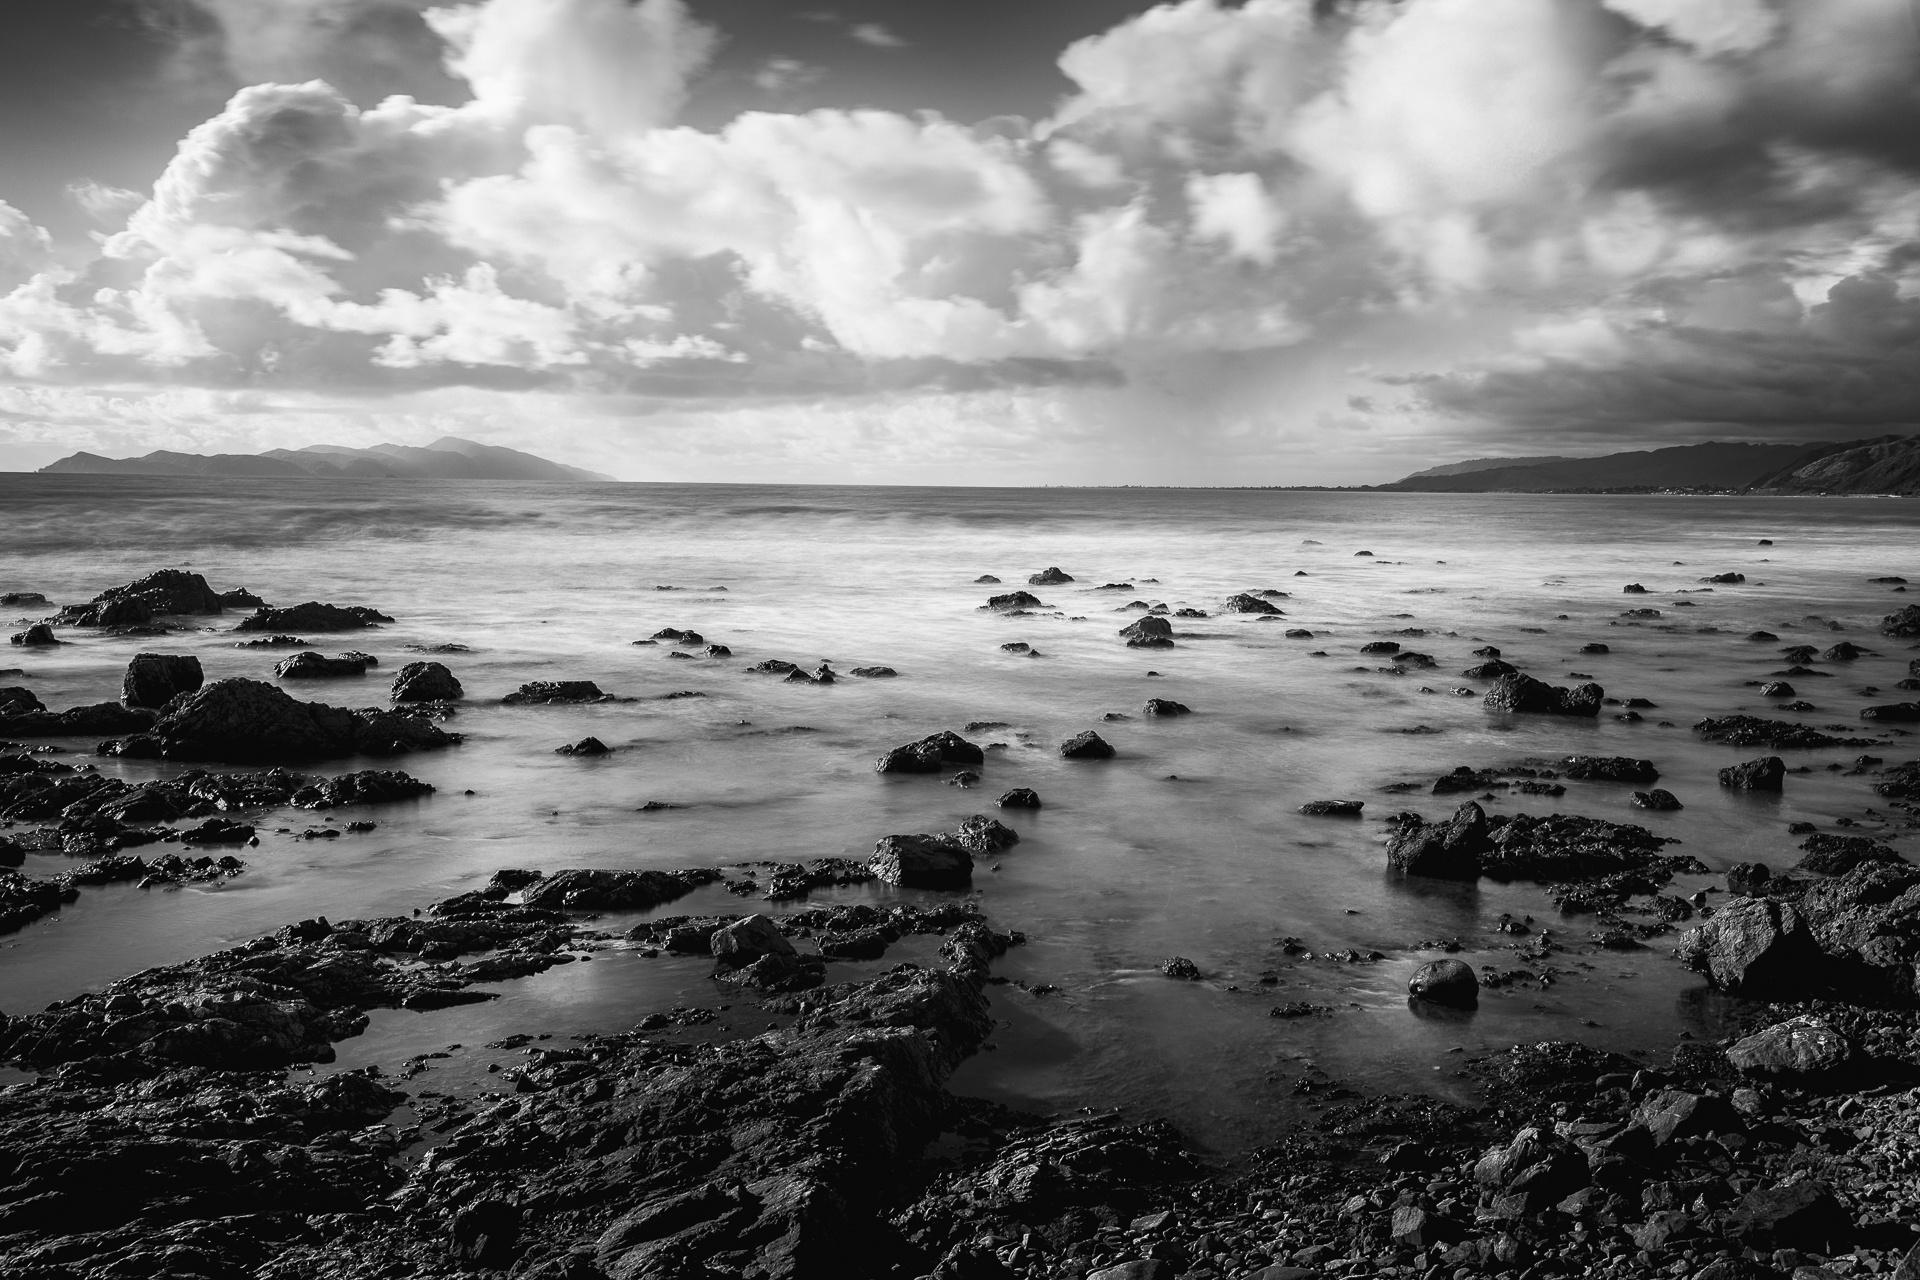 Kapiti Island and the Paraparaumu coastline